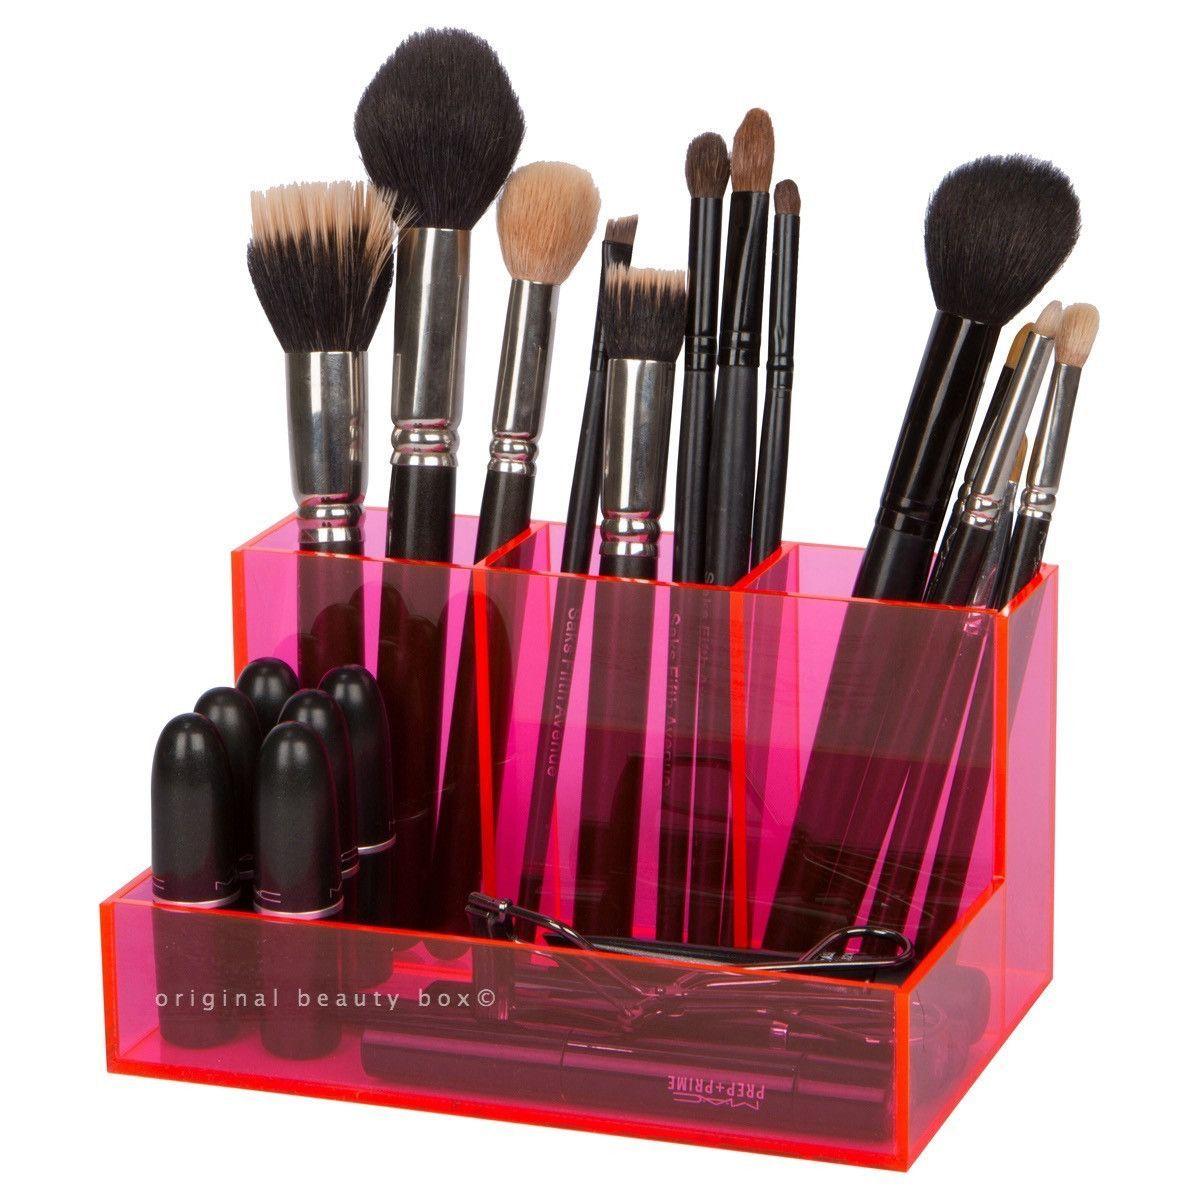 PINK BRUSH HOLDER Pink brushes, Original beauty box